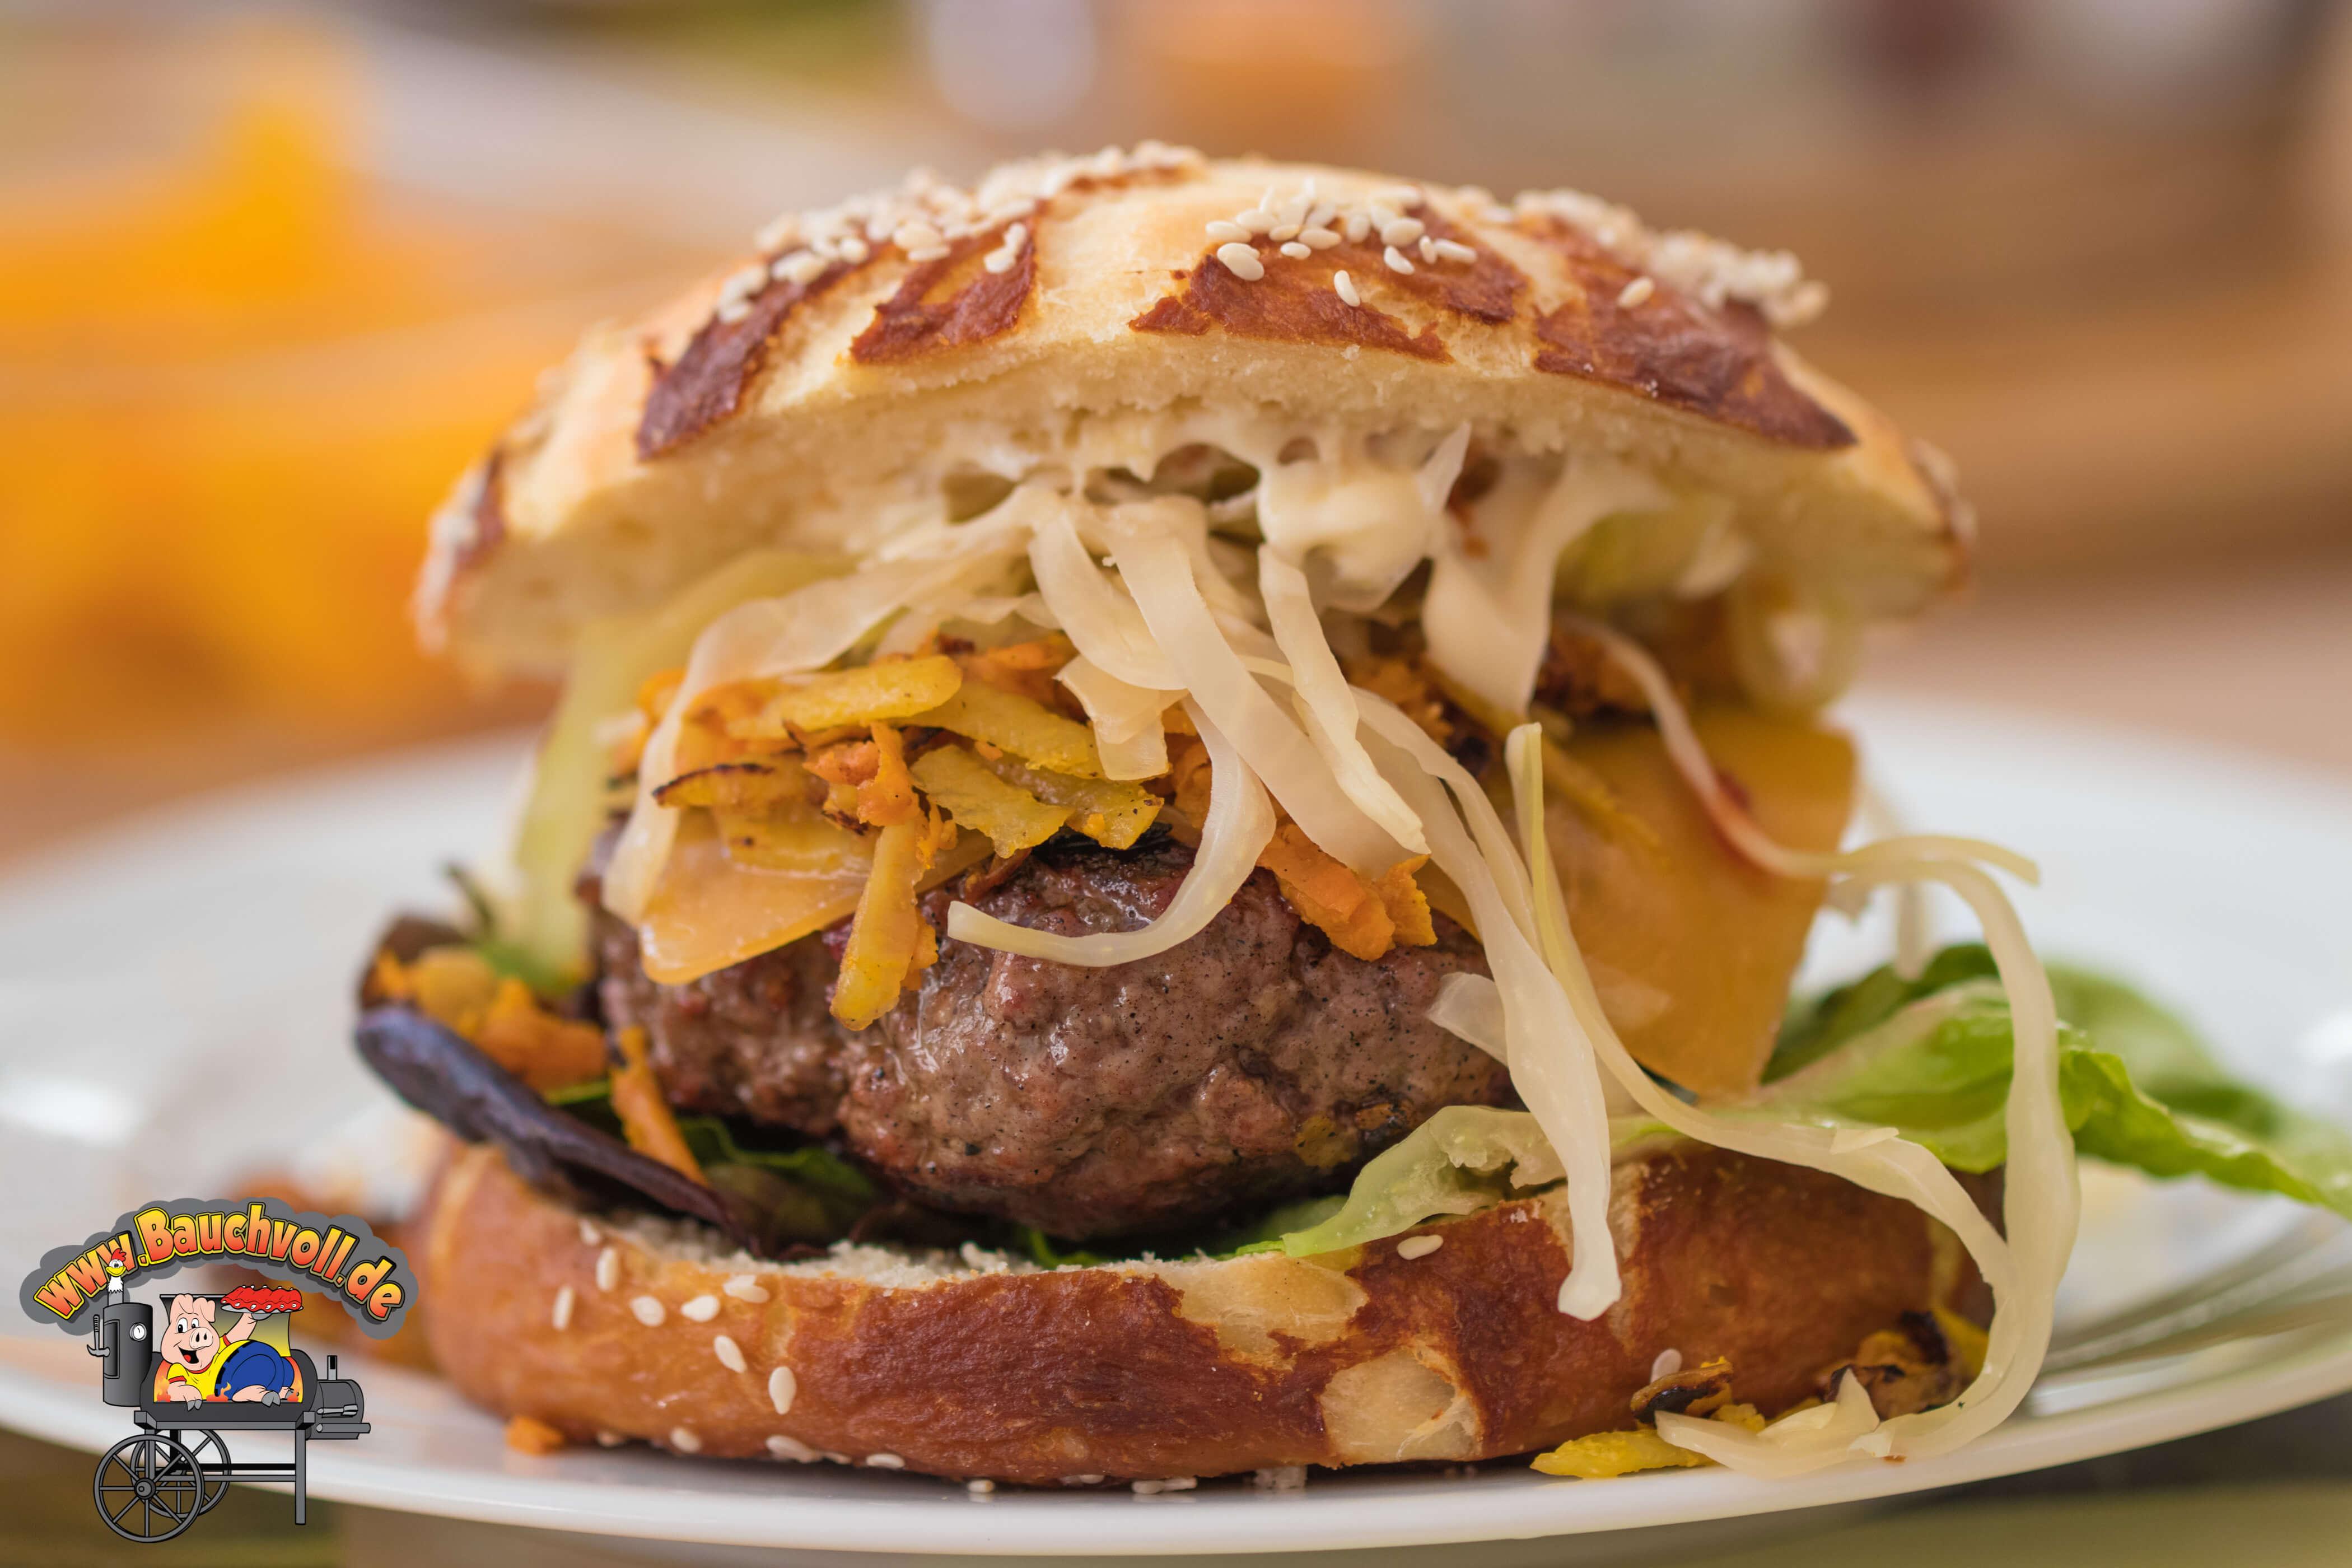 Sauerkraut schmeckt auch perfekt auf Burger!